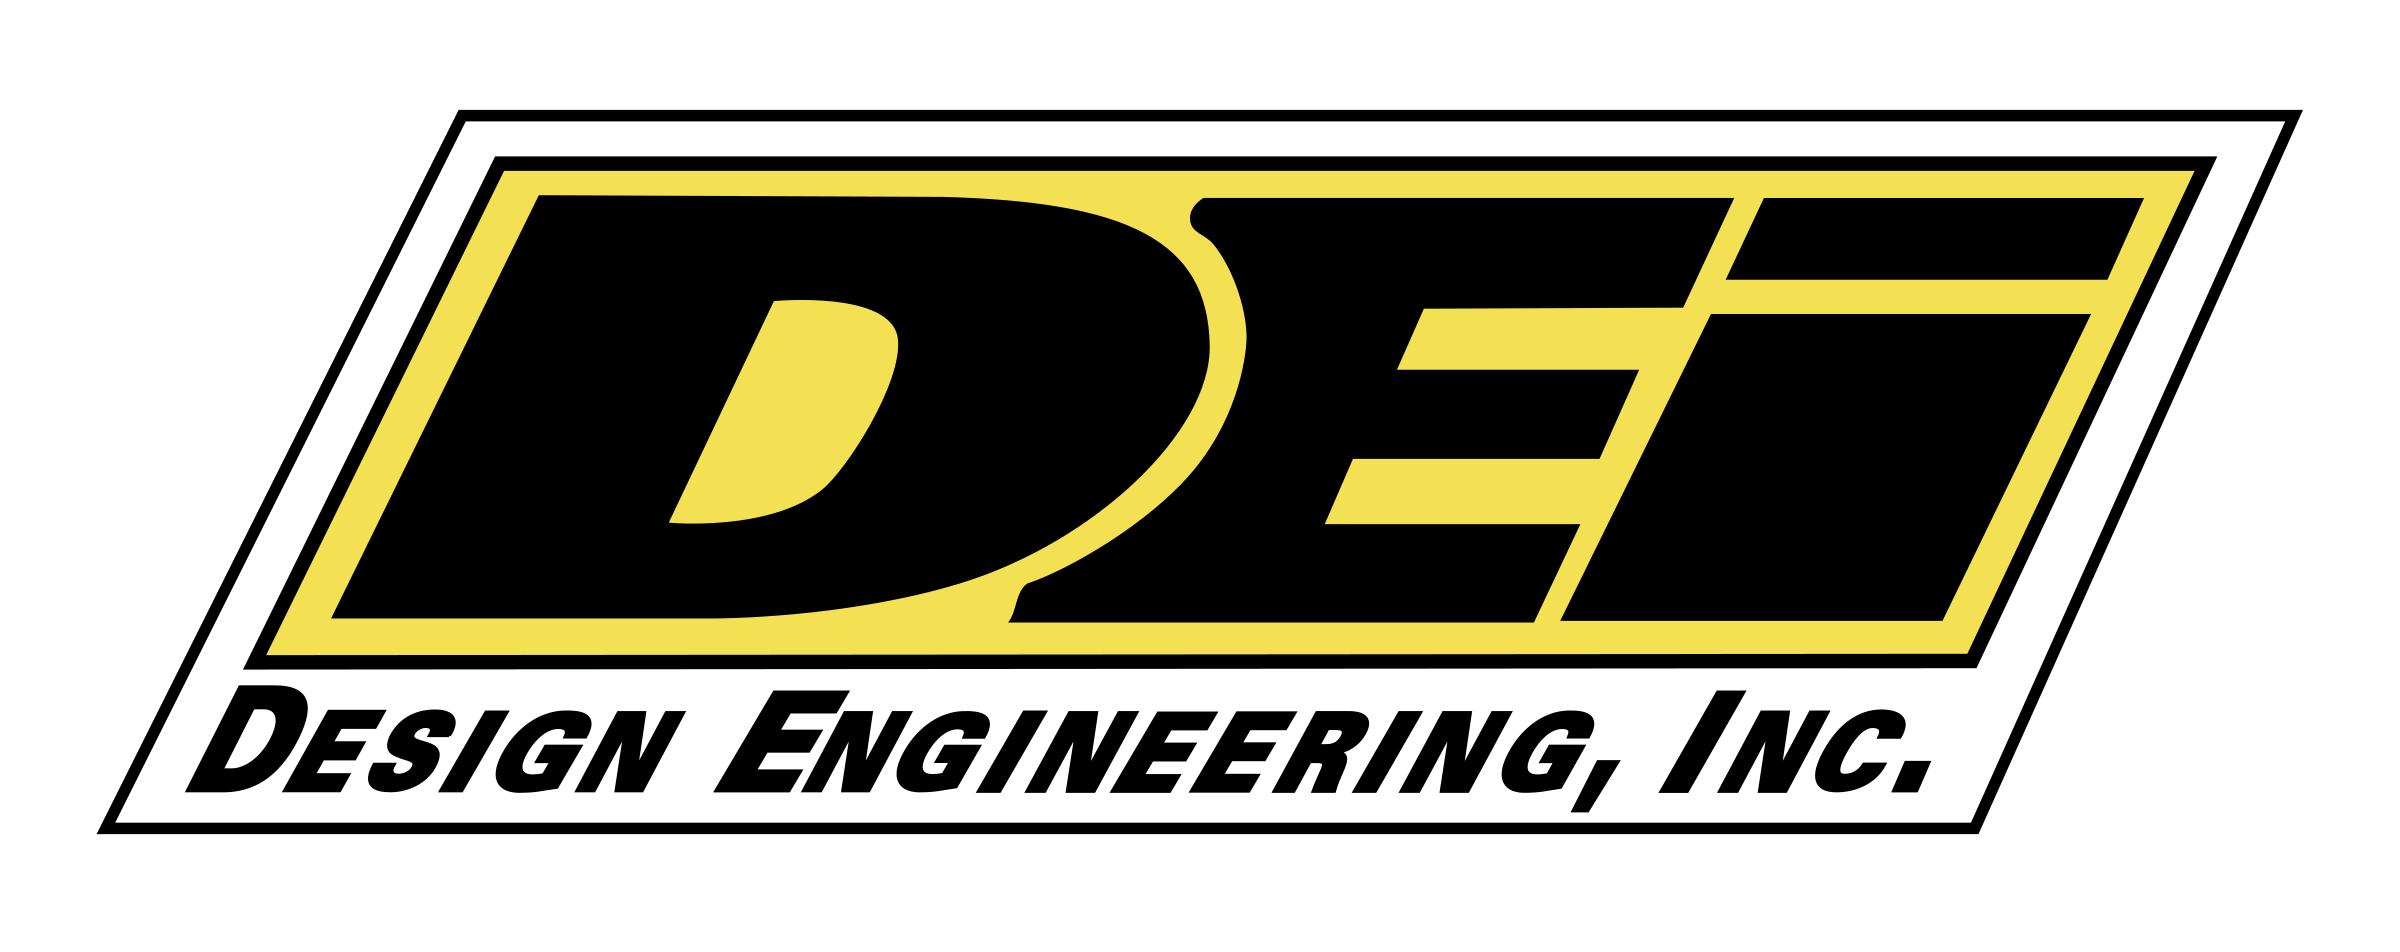 Design Engineering Inc. logo